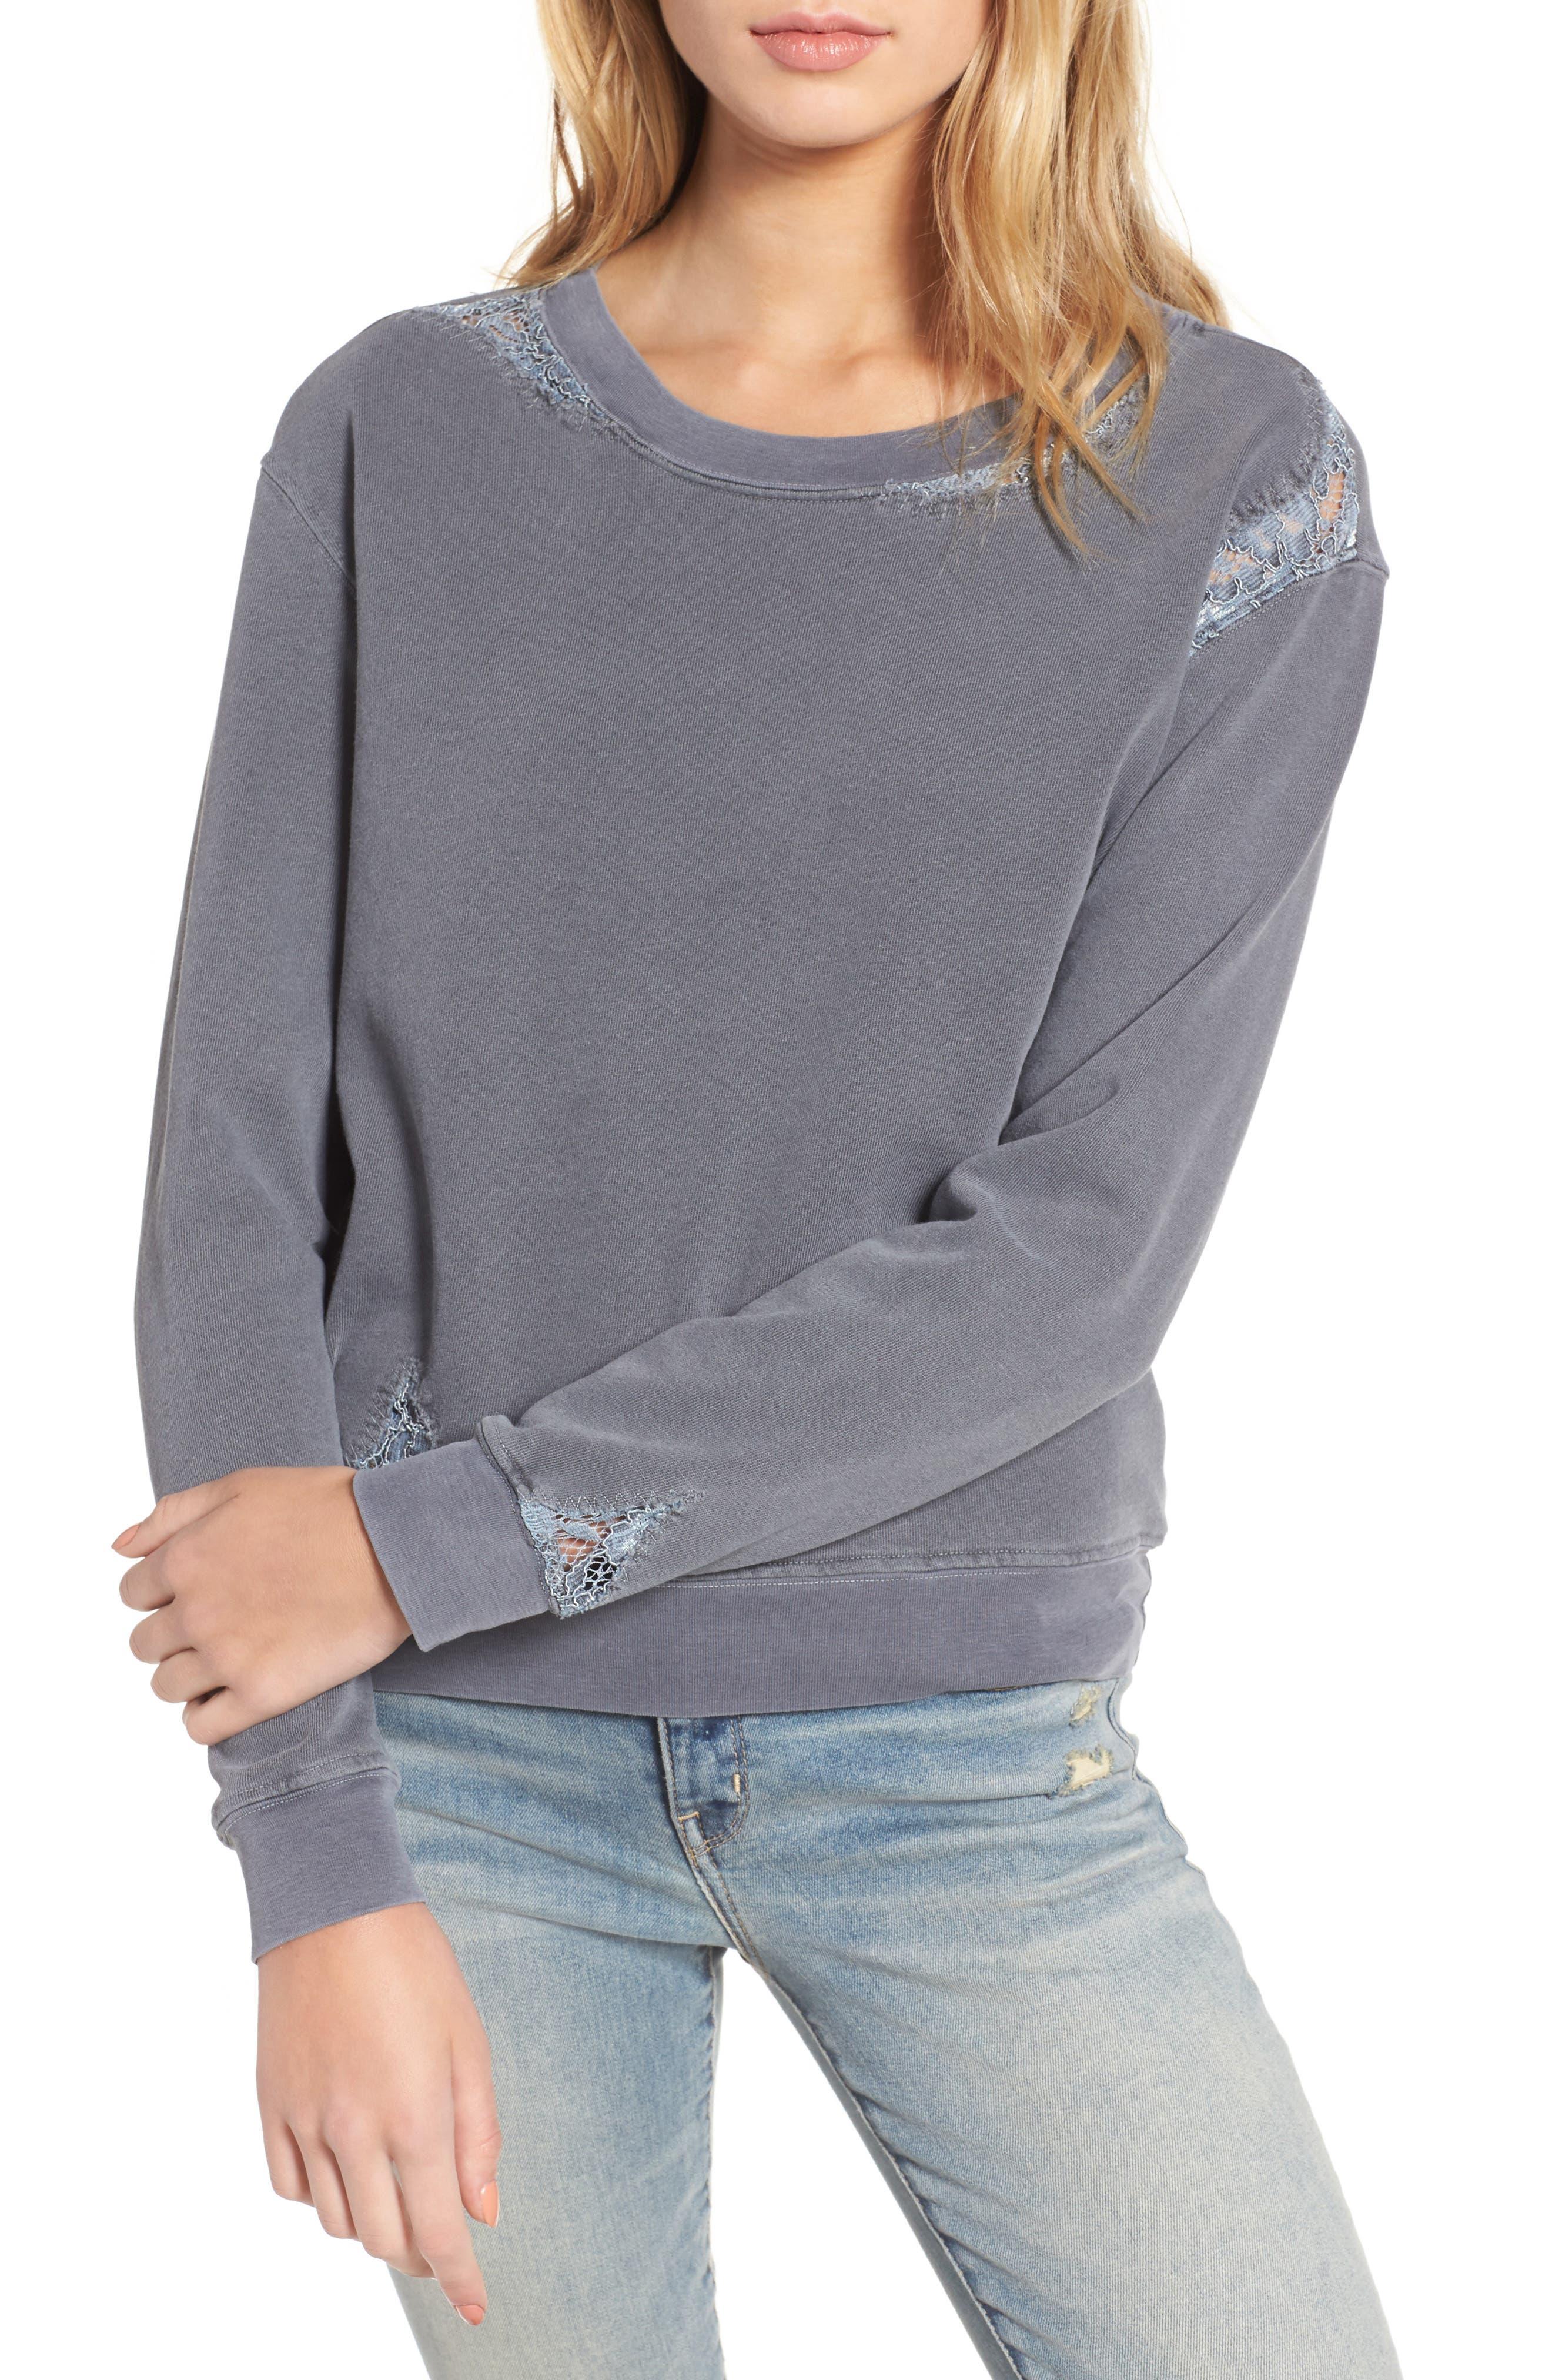 Alternate Image 1 Selected - Stateside Lace Trim Sweatshirt